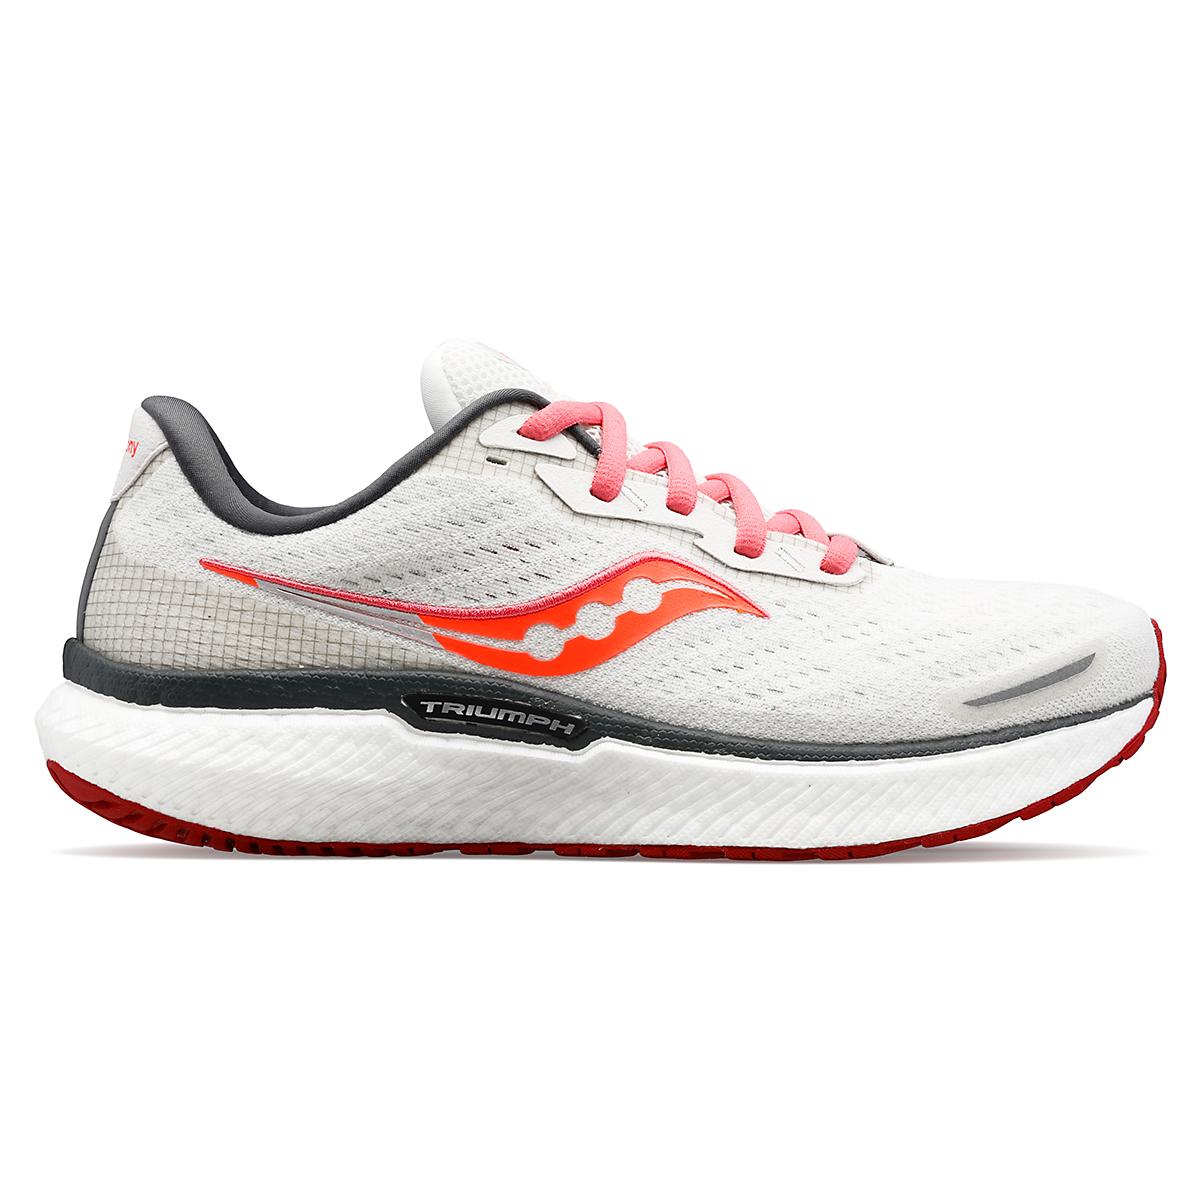 Women's Saucony Triumph 19 Running Shoe - Color: Jackalope - Size: 5 - Width: Regular, Jackalope, large, image 1